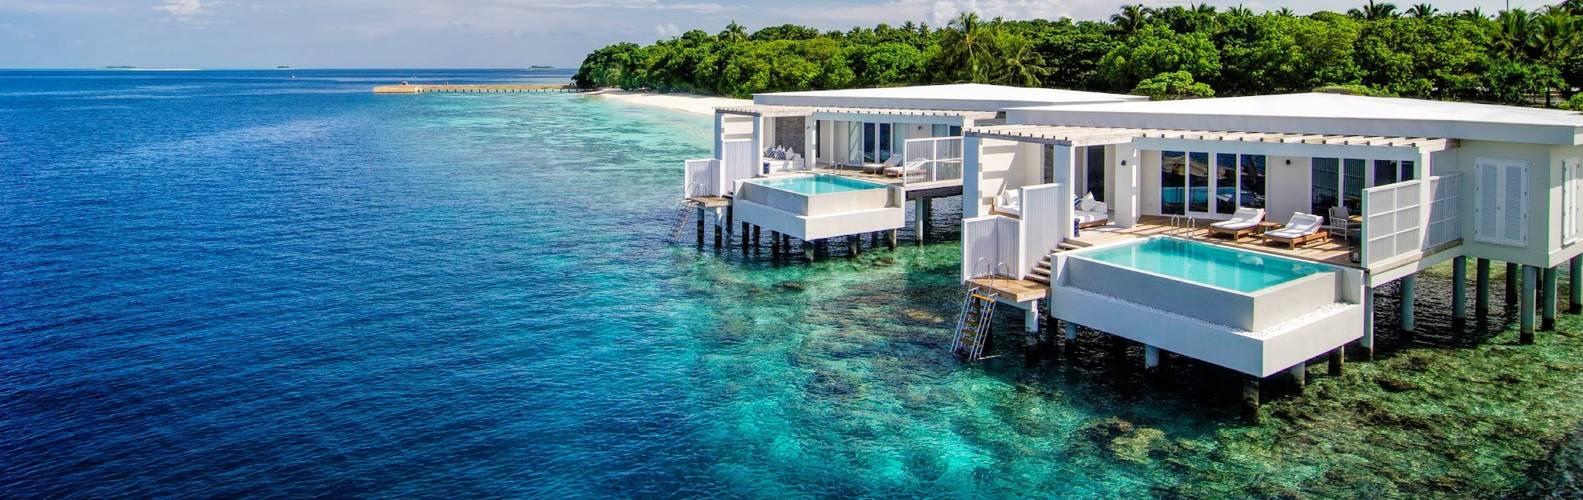 Amilla Fushi Maldives - House Reef